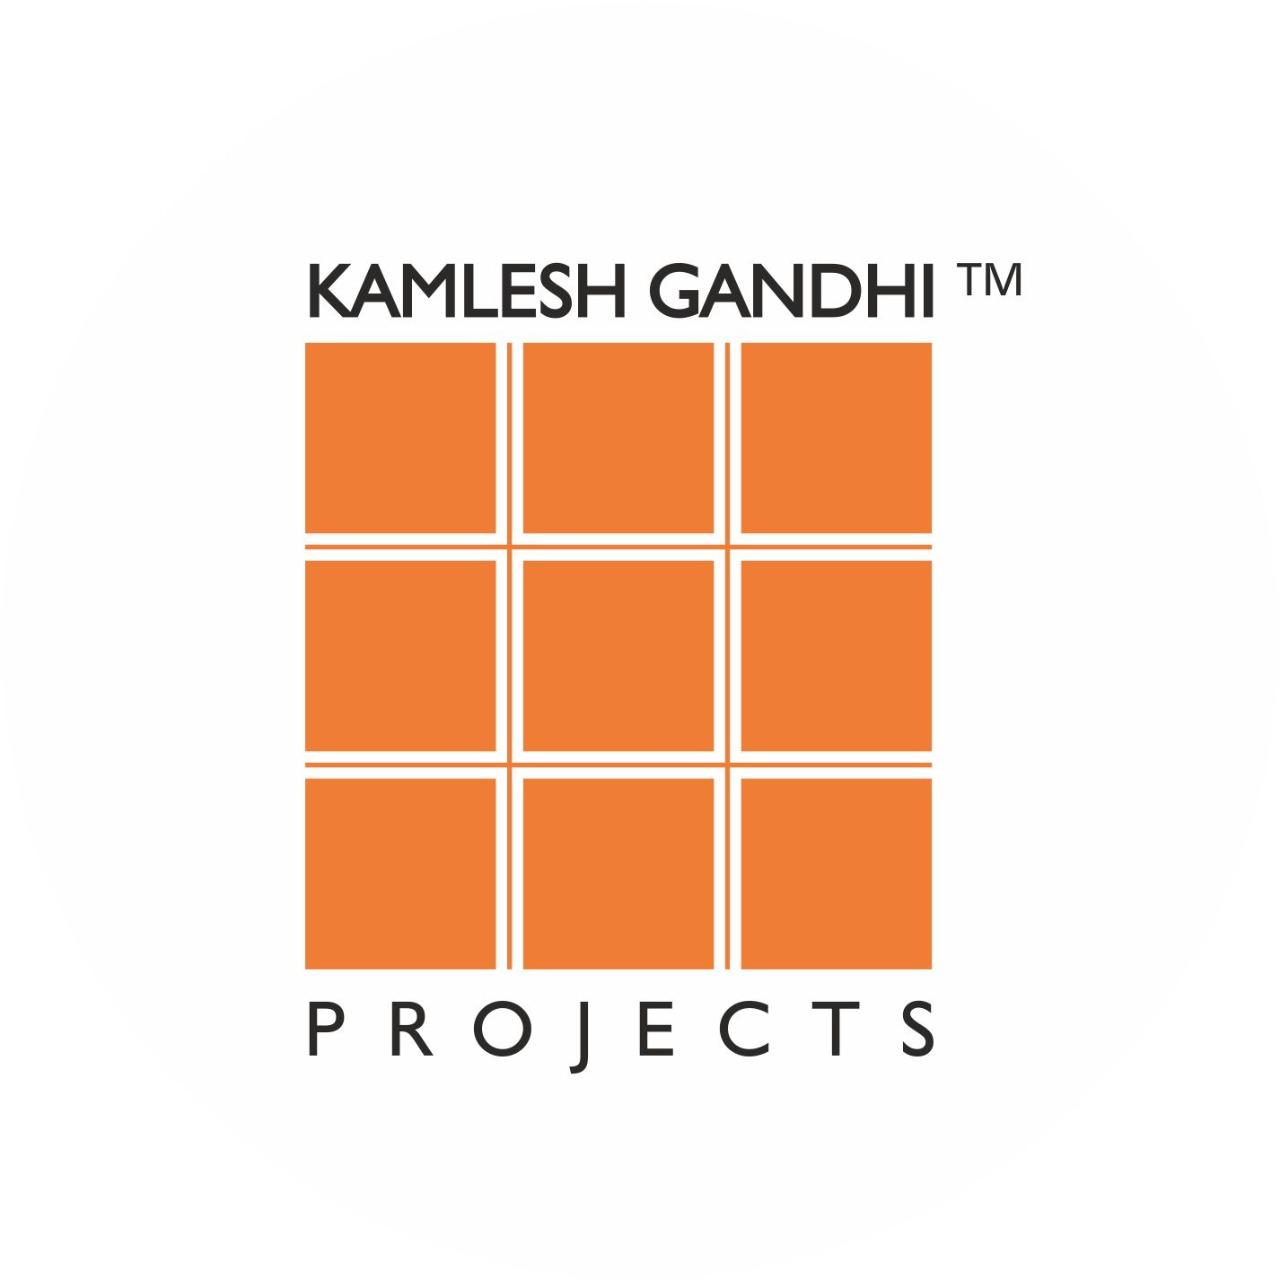 Kamlesh Gandhi Projects